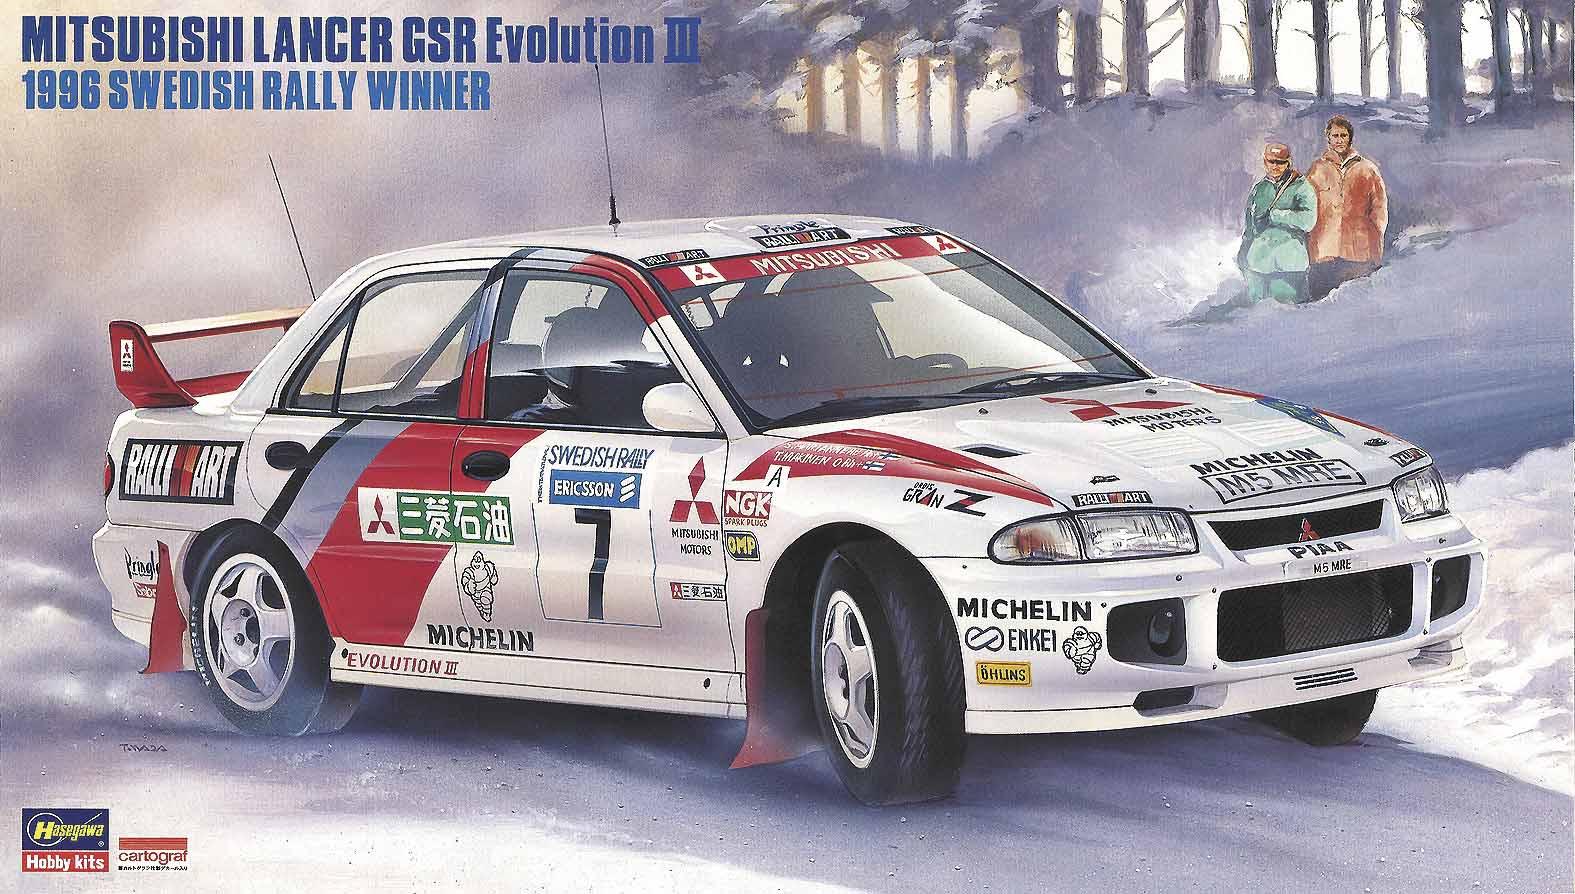 Hasegawa 1/24 Mitsubishi Lancer GSR Evolution III 1996 Swedish Rally winner